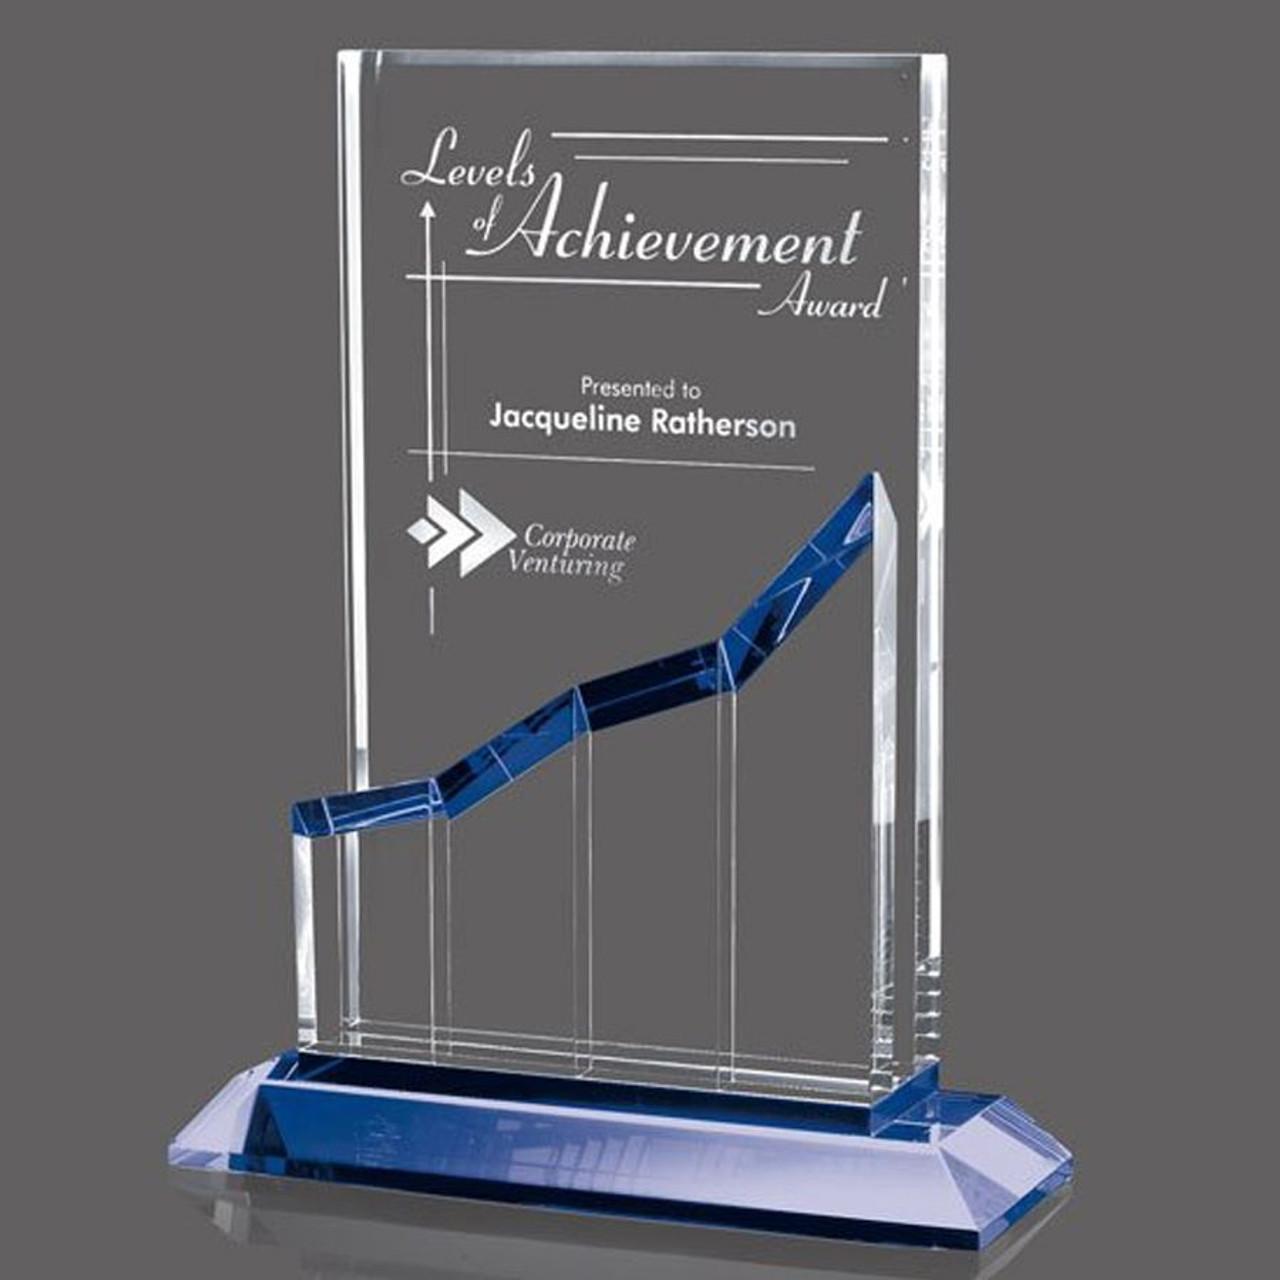 Crystal Achievement Award